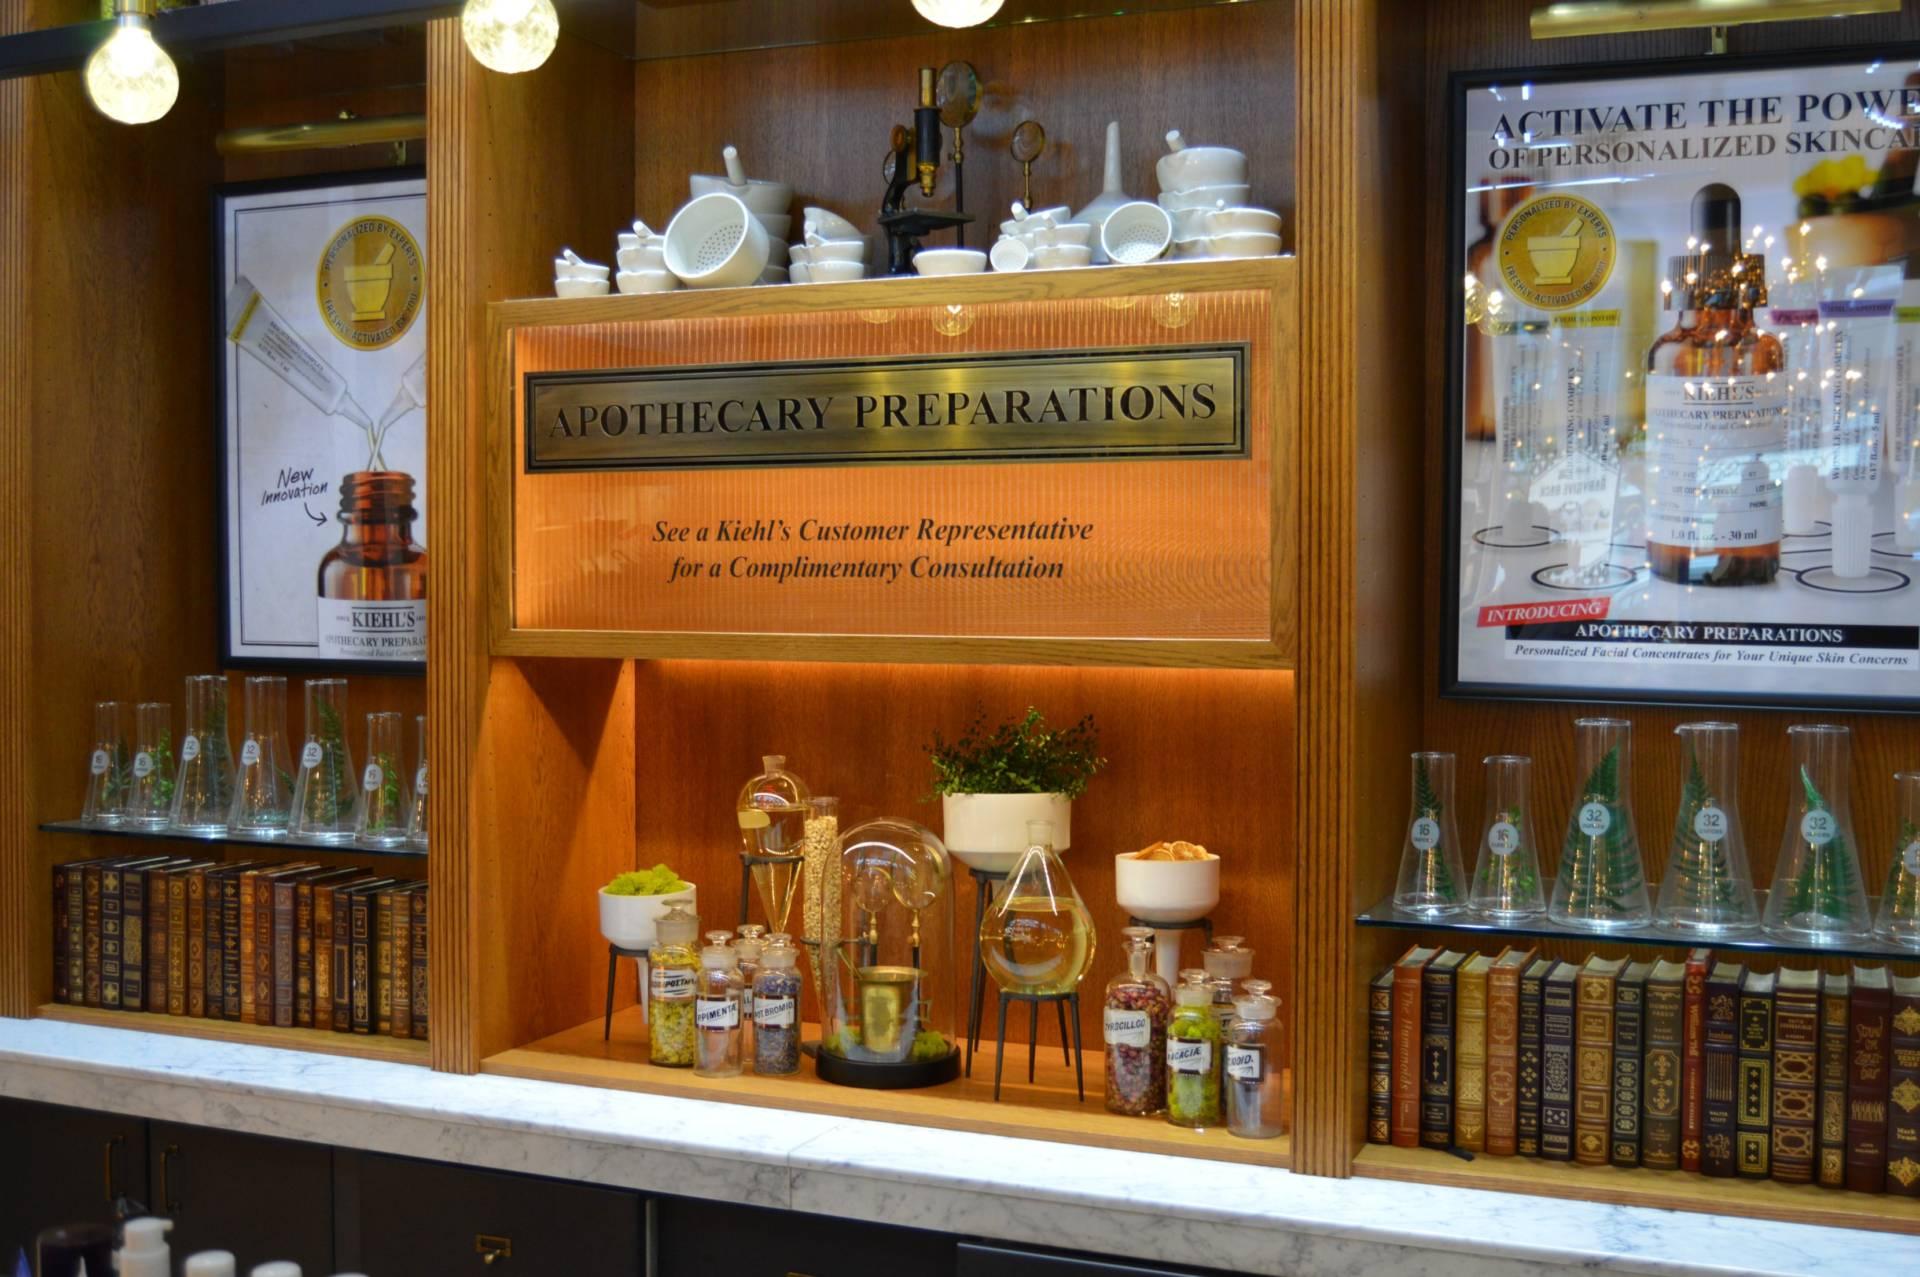 kiehls-inhautepursuit-review-apothecary-preparations